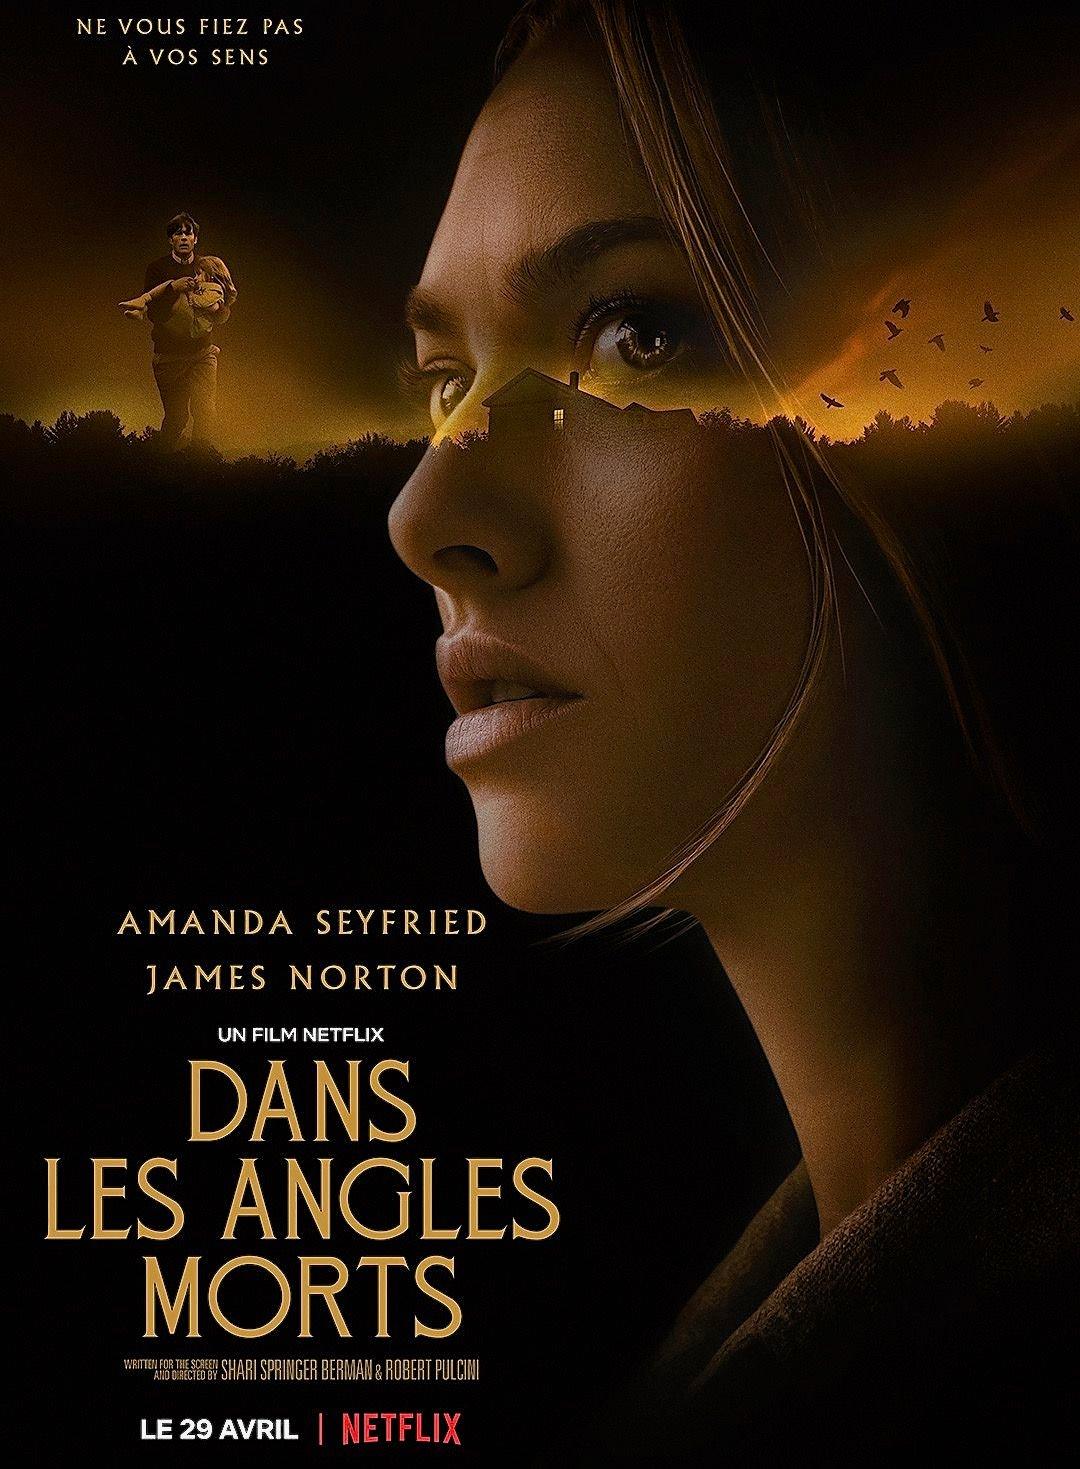 Dans les angles morts - Film (2021)